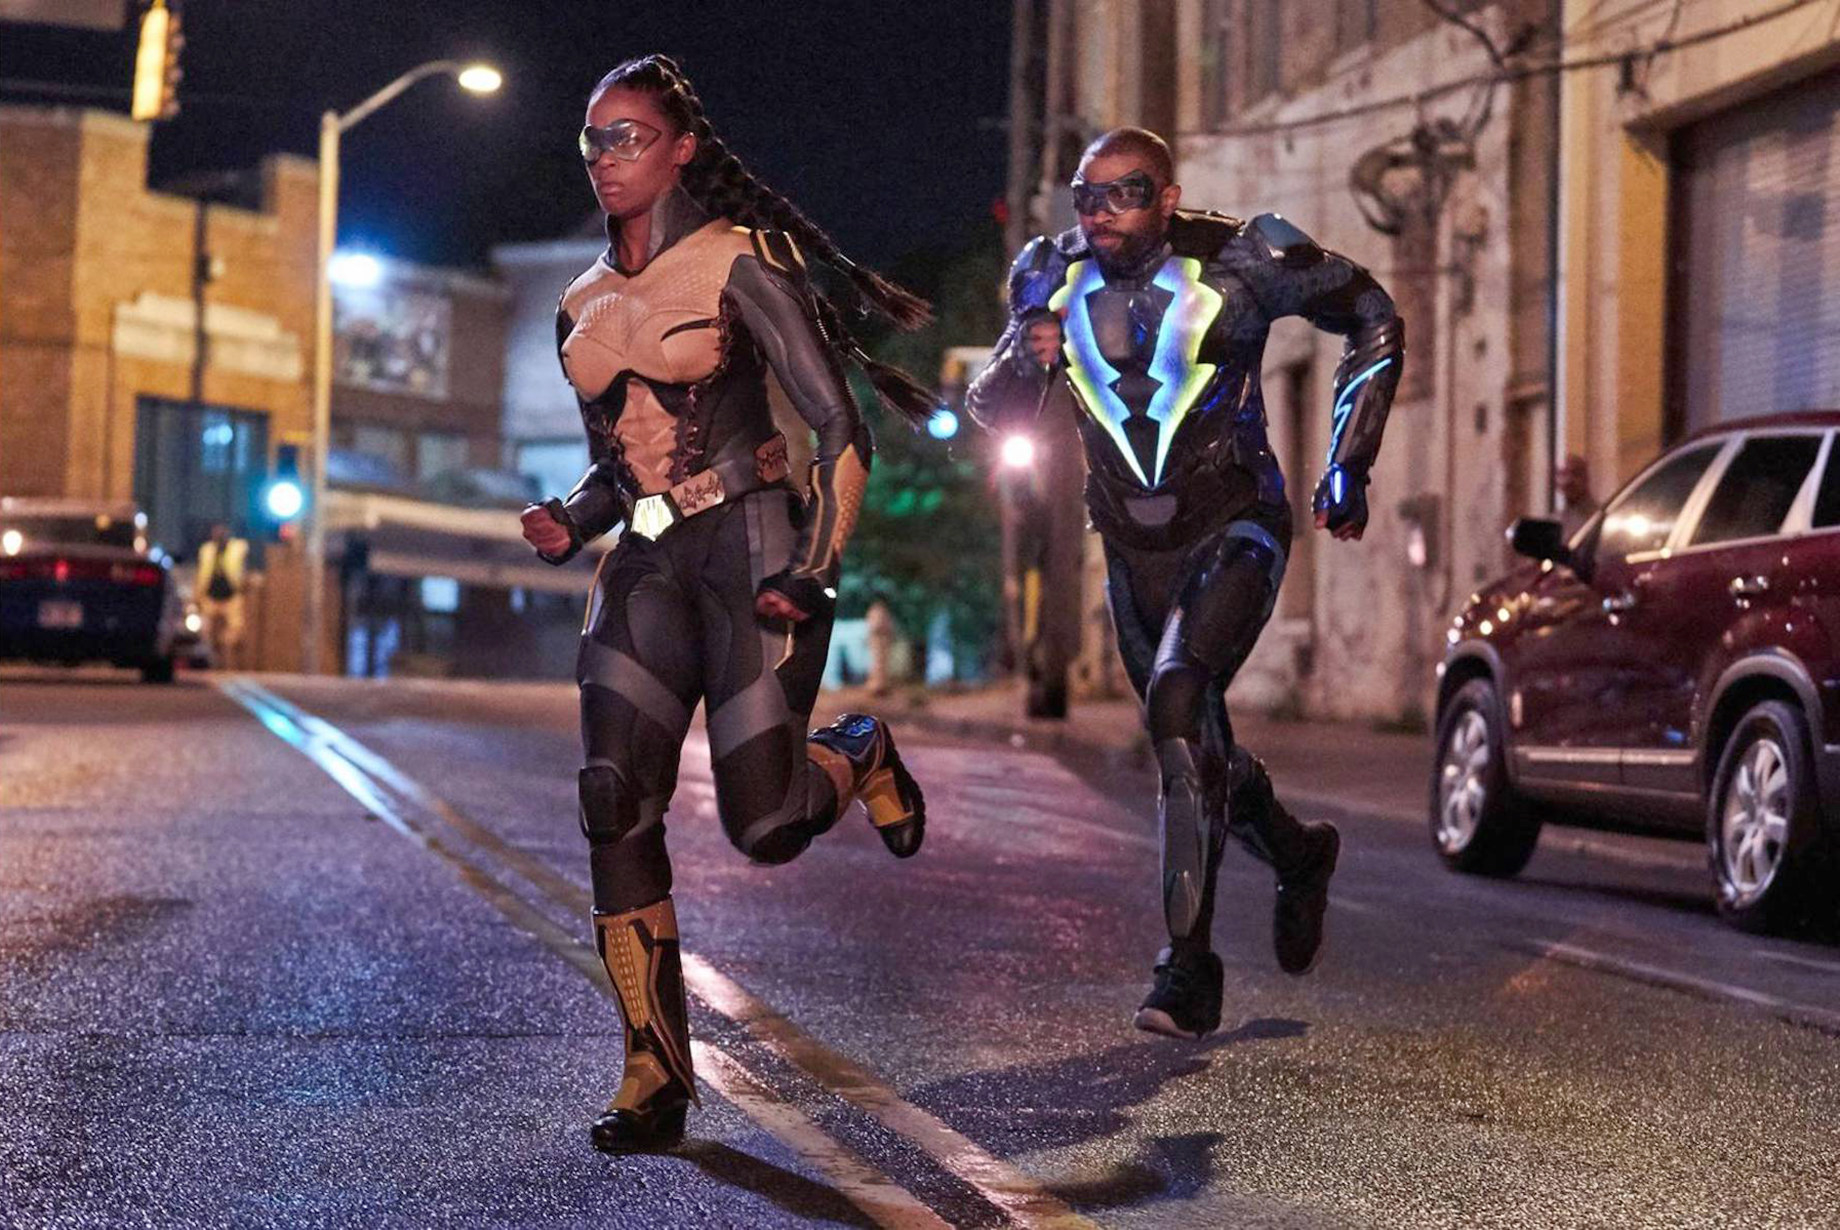 Nafessa Williams and Cress Williams run in supersuits.